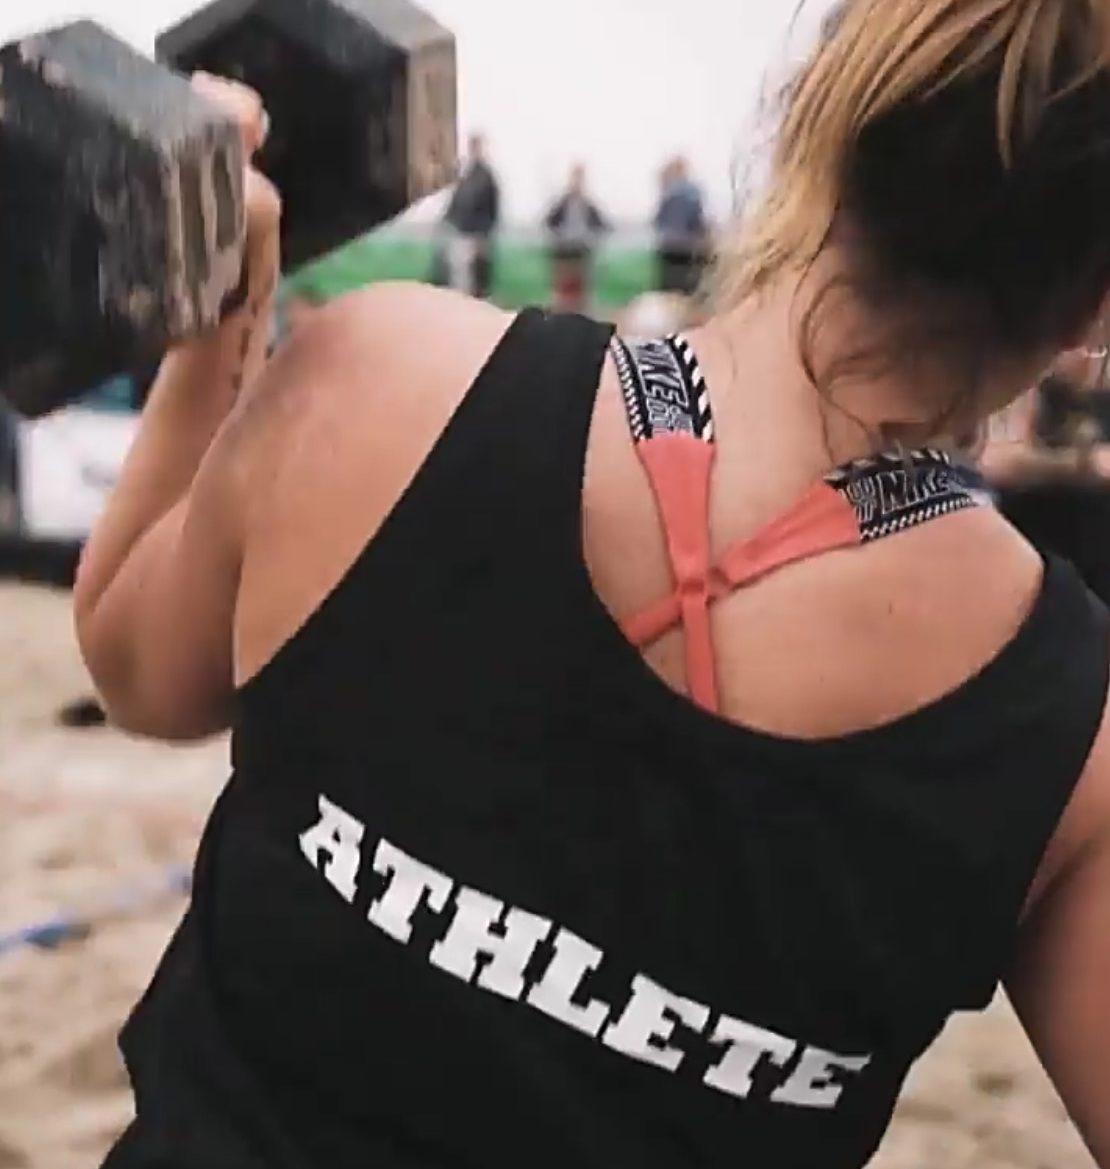 Denise Janda Athlete CrossFit Langenfeld